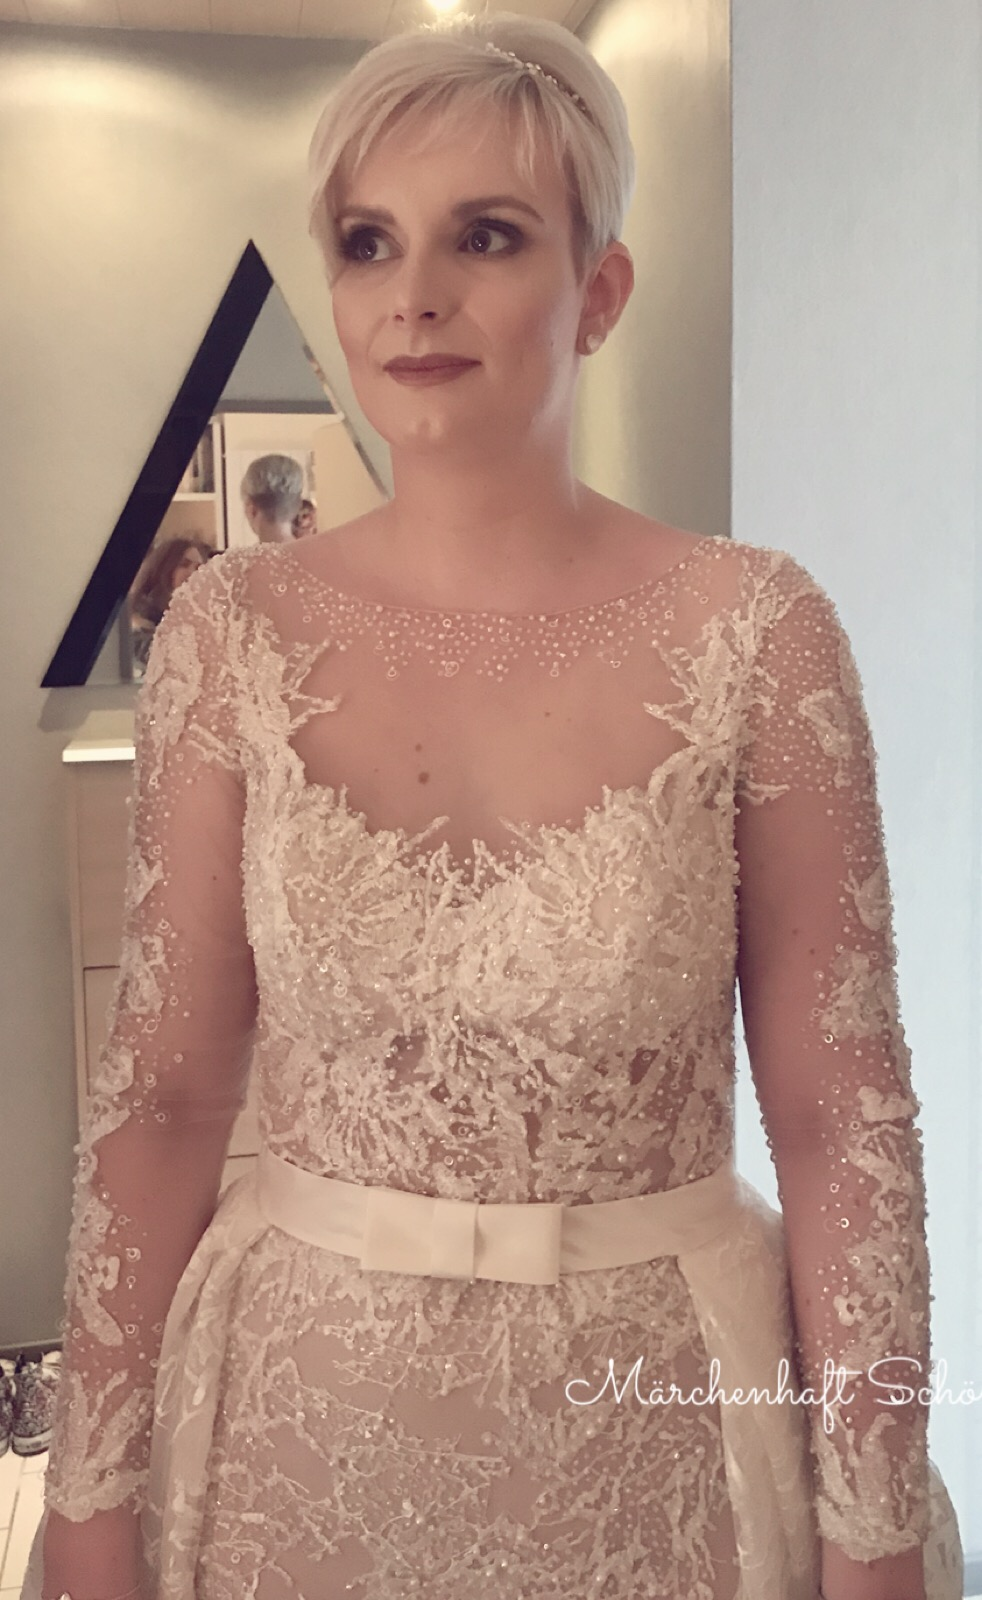 Hochzeit  maerchenhaftschoenpb